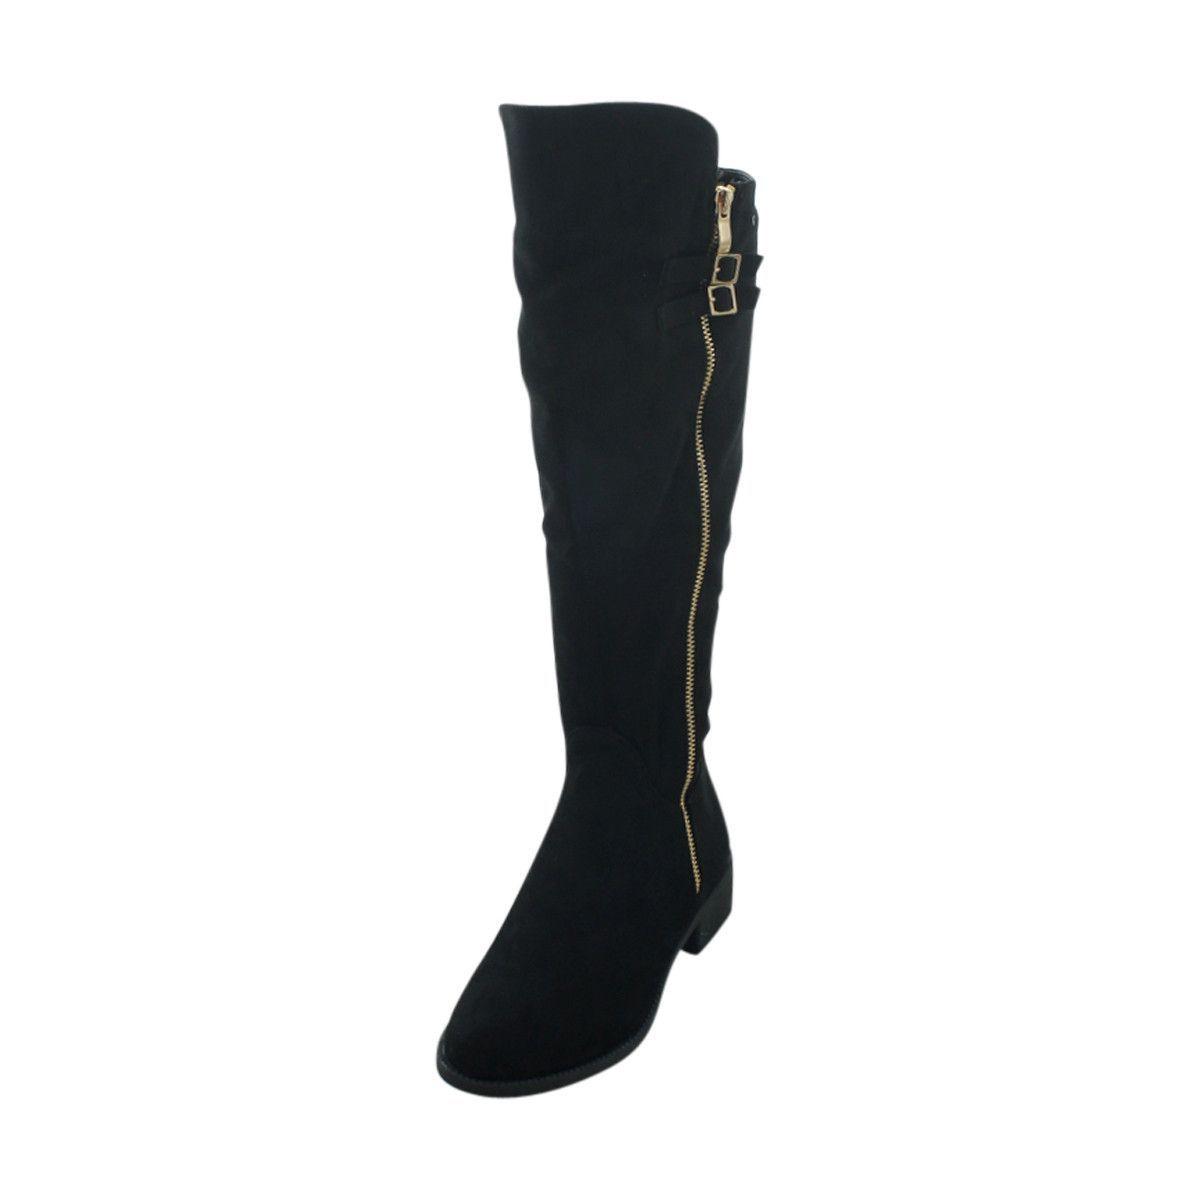 Top Moda - Women's Double Zipper Boots - Black